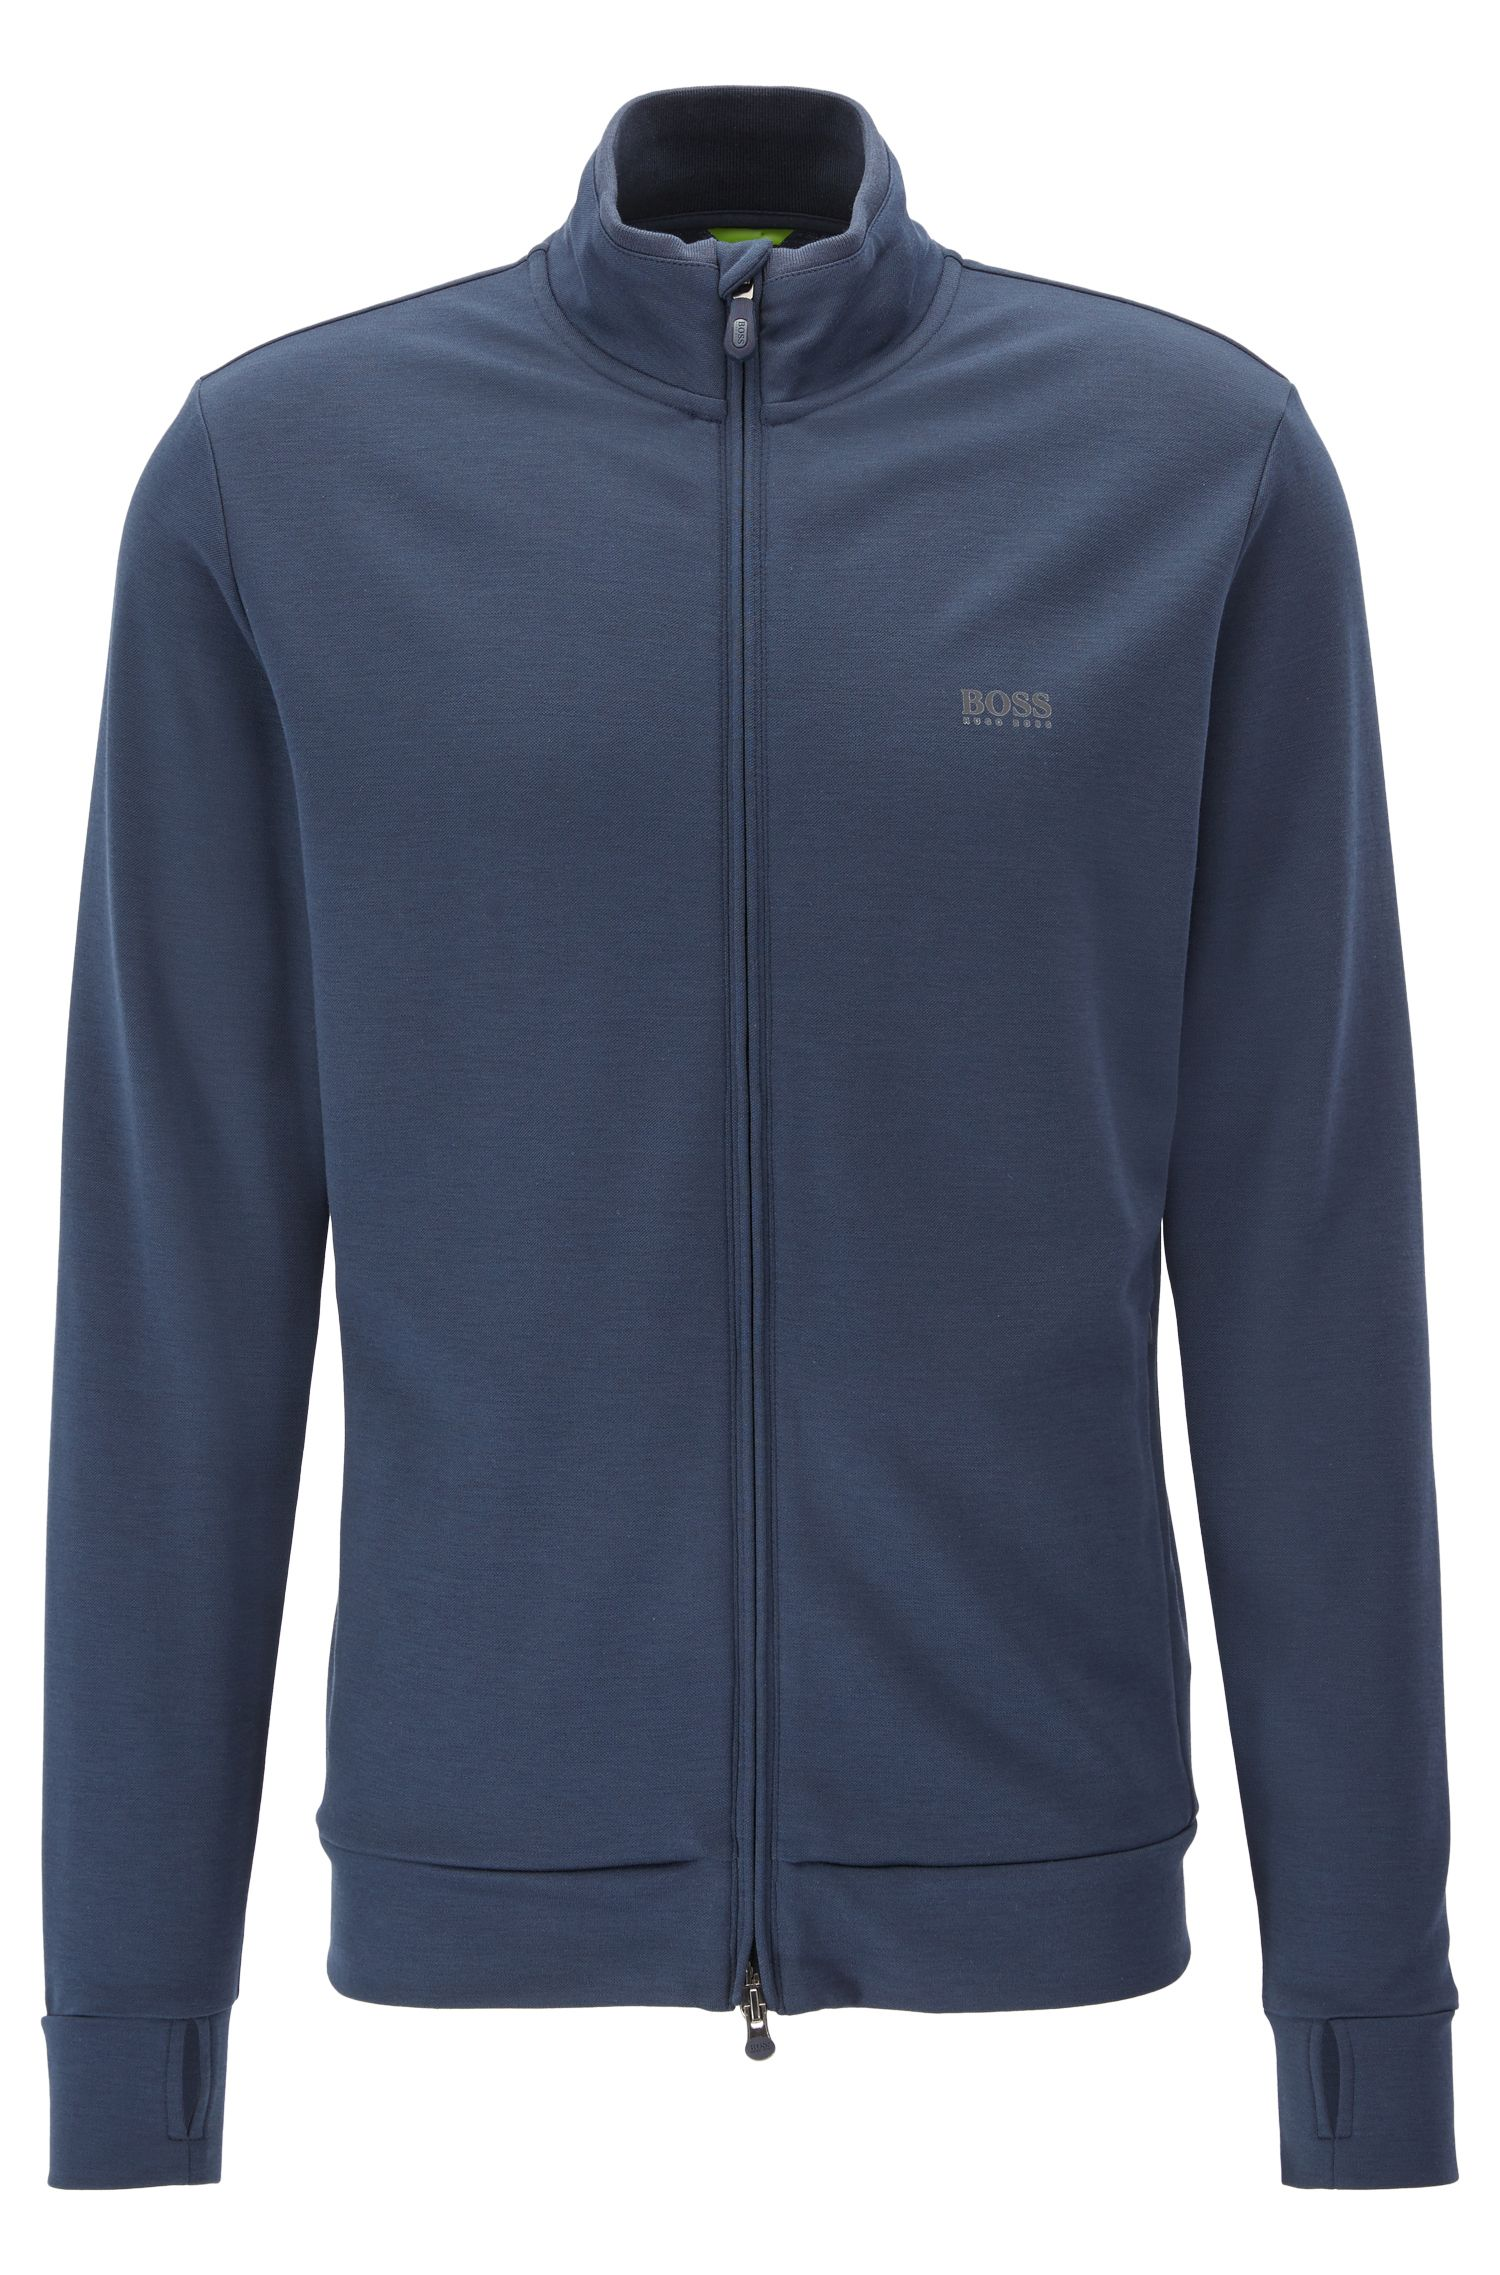 Cotton Blend Sweat Jacket | SL Tech